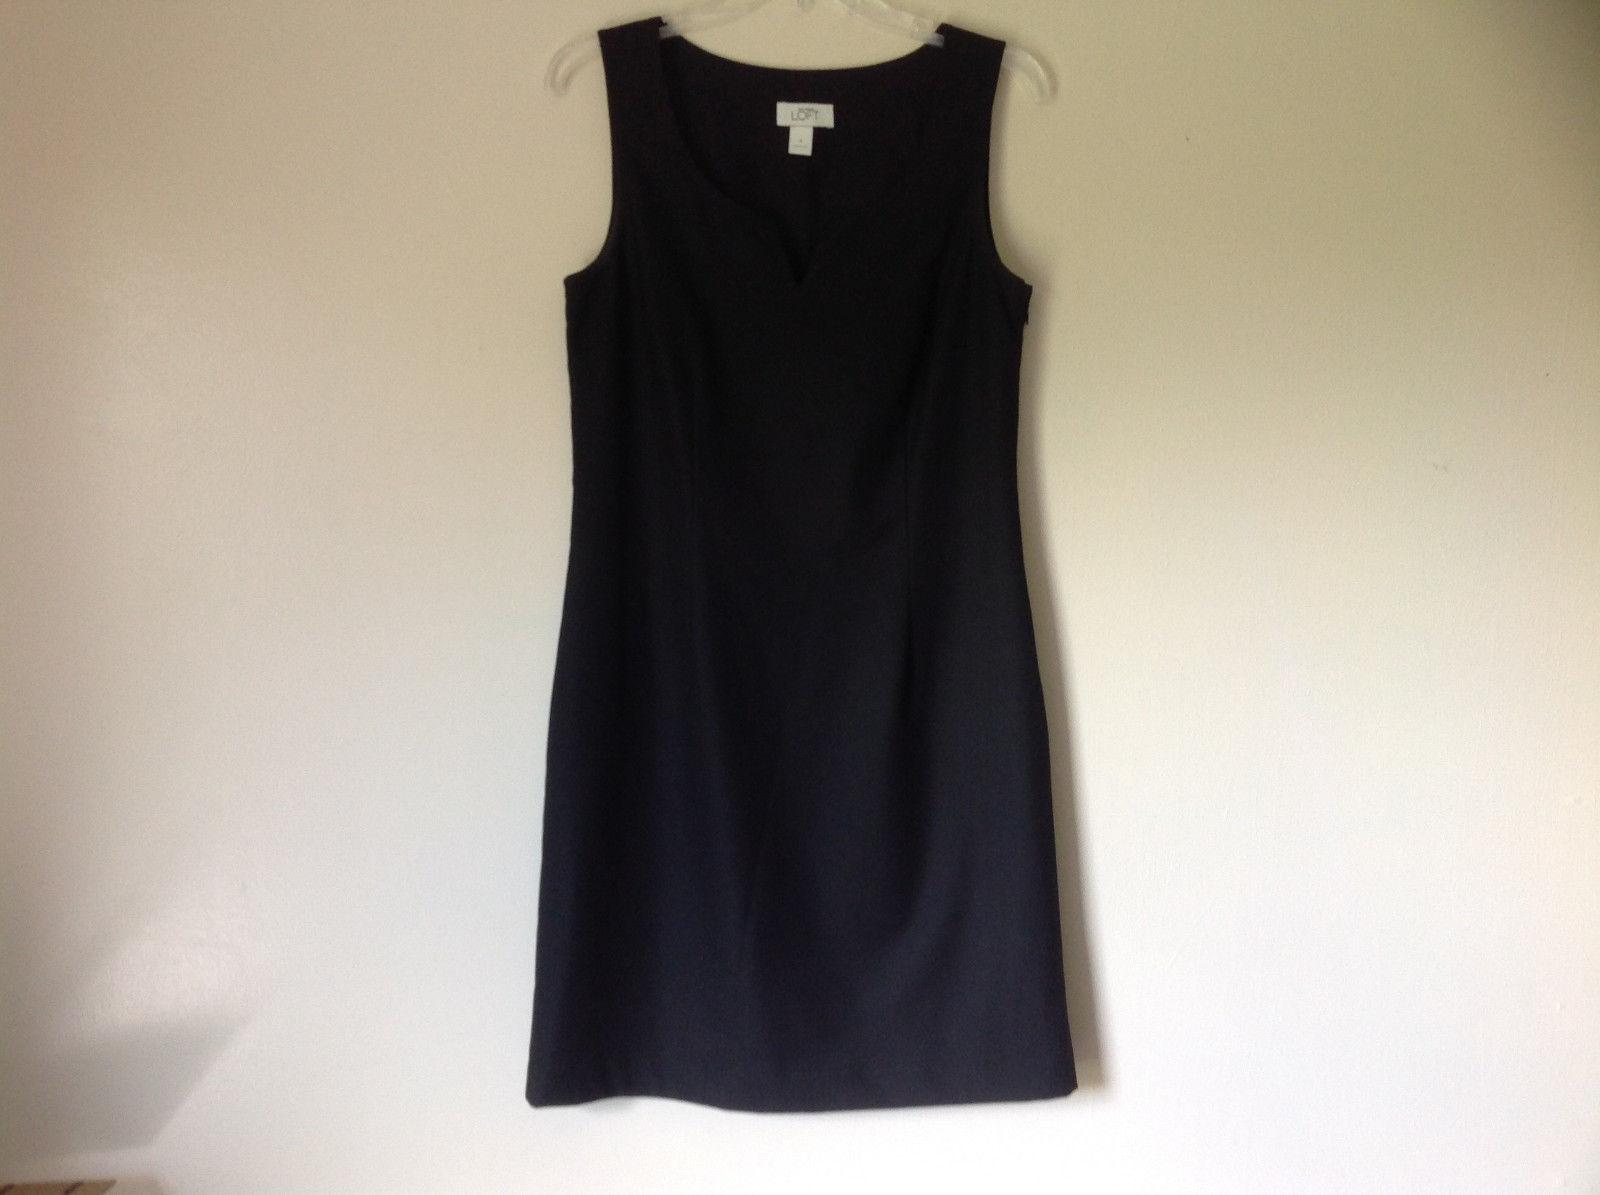 Ann Taylor Loft Little Black Sleeveless Dress Scoop Neck Zipper Closure Size 6